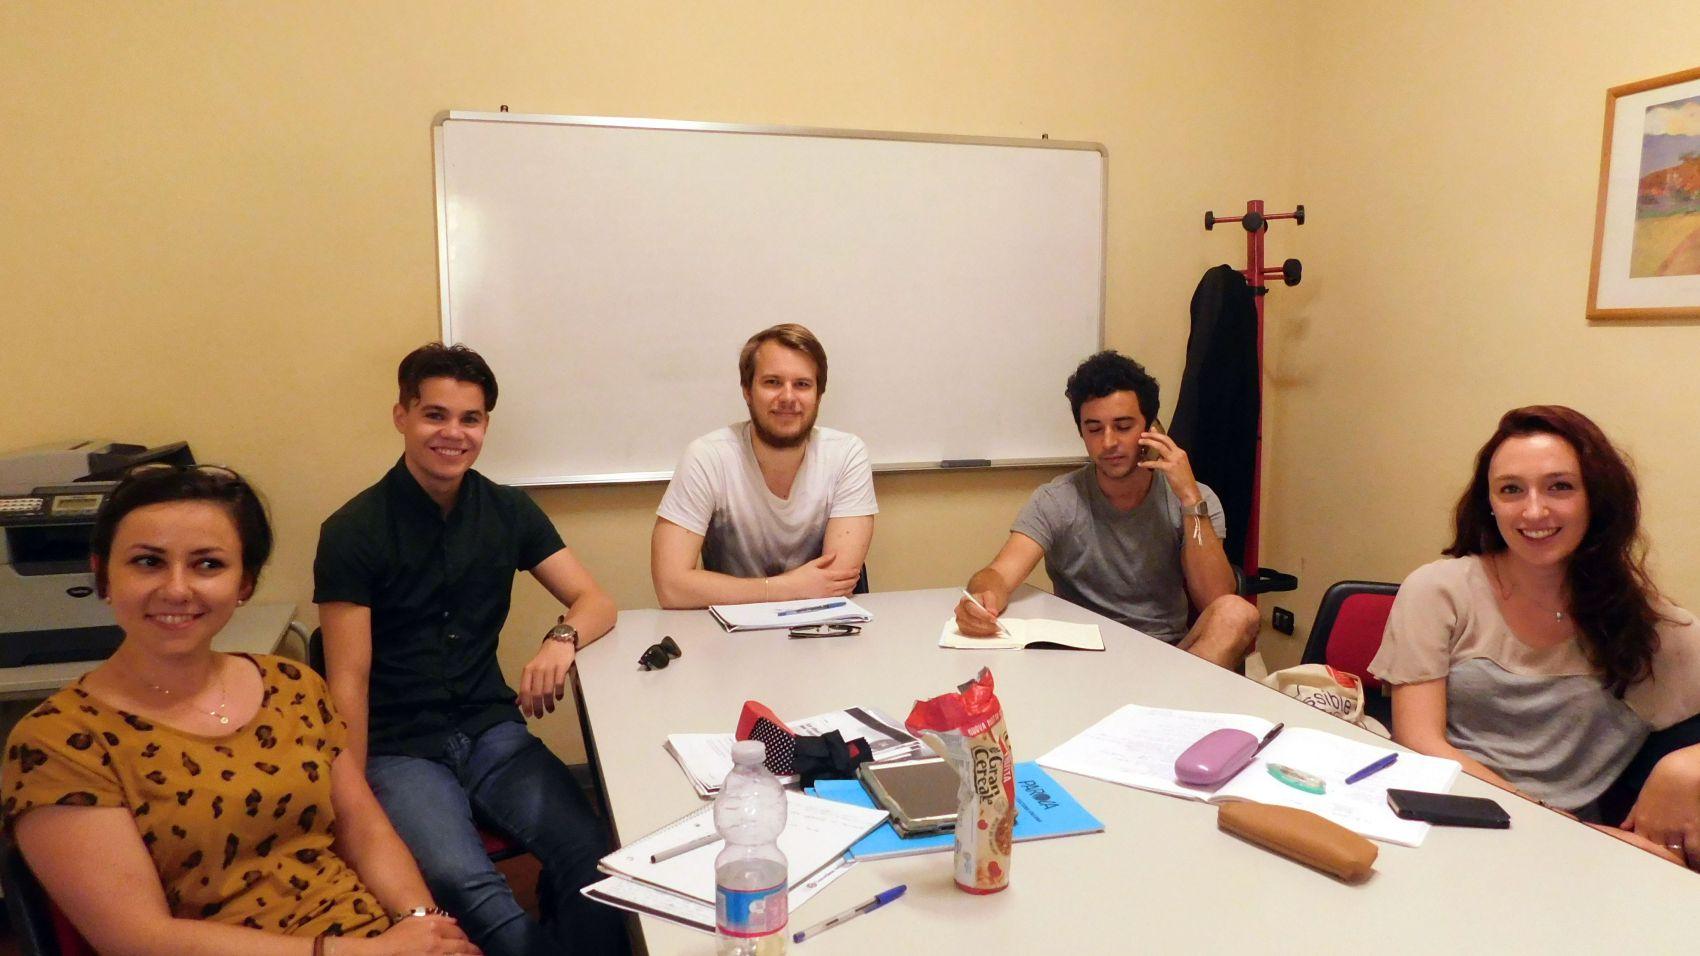 Group Italian language lesson in Florence at Parola school